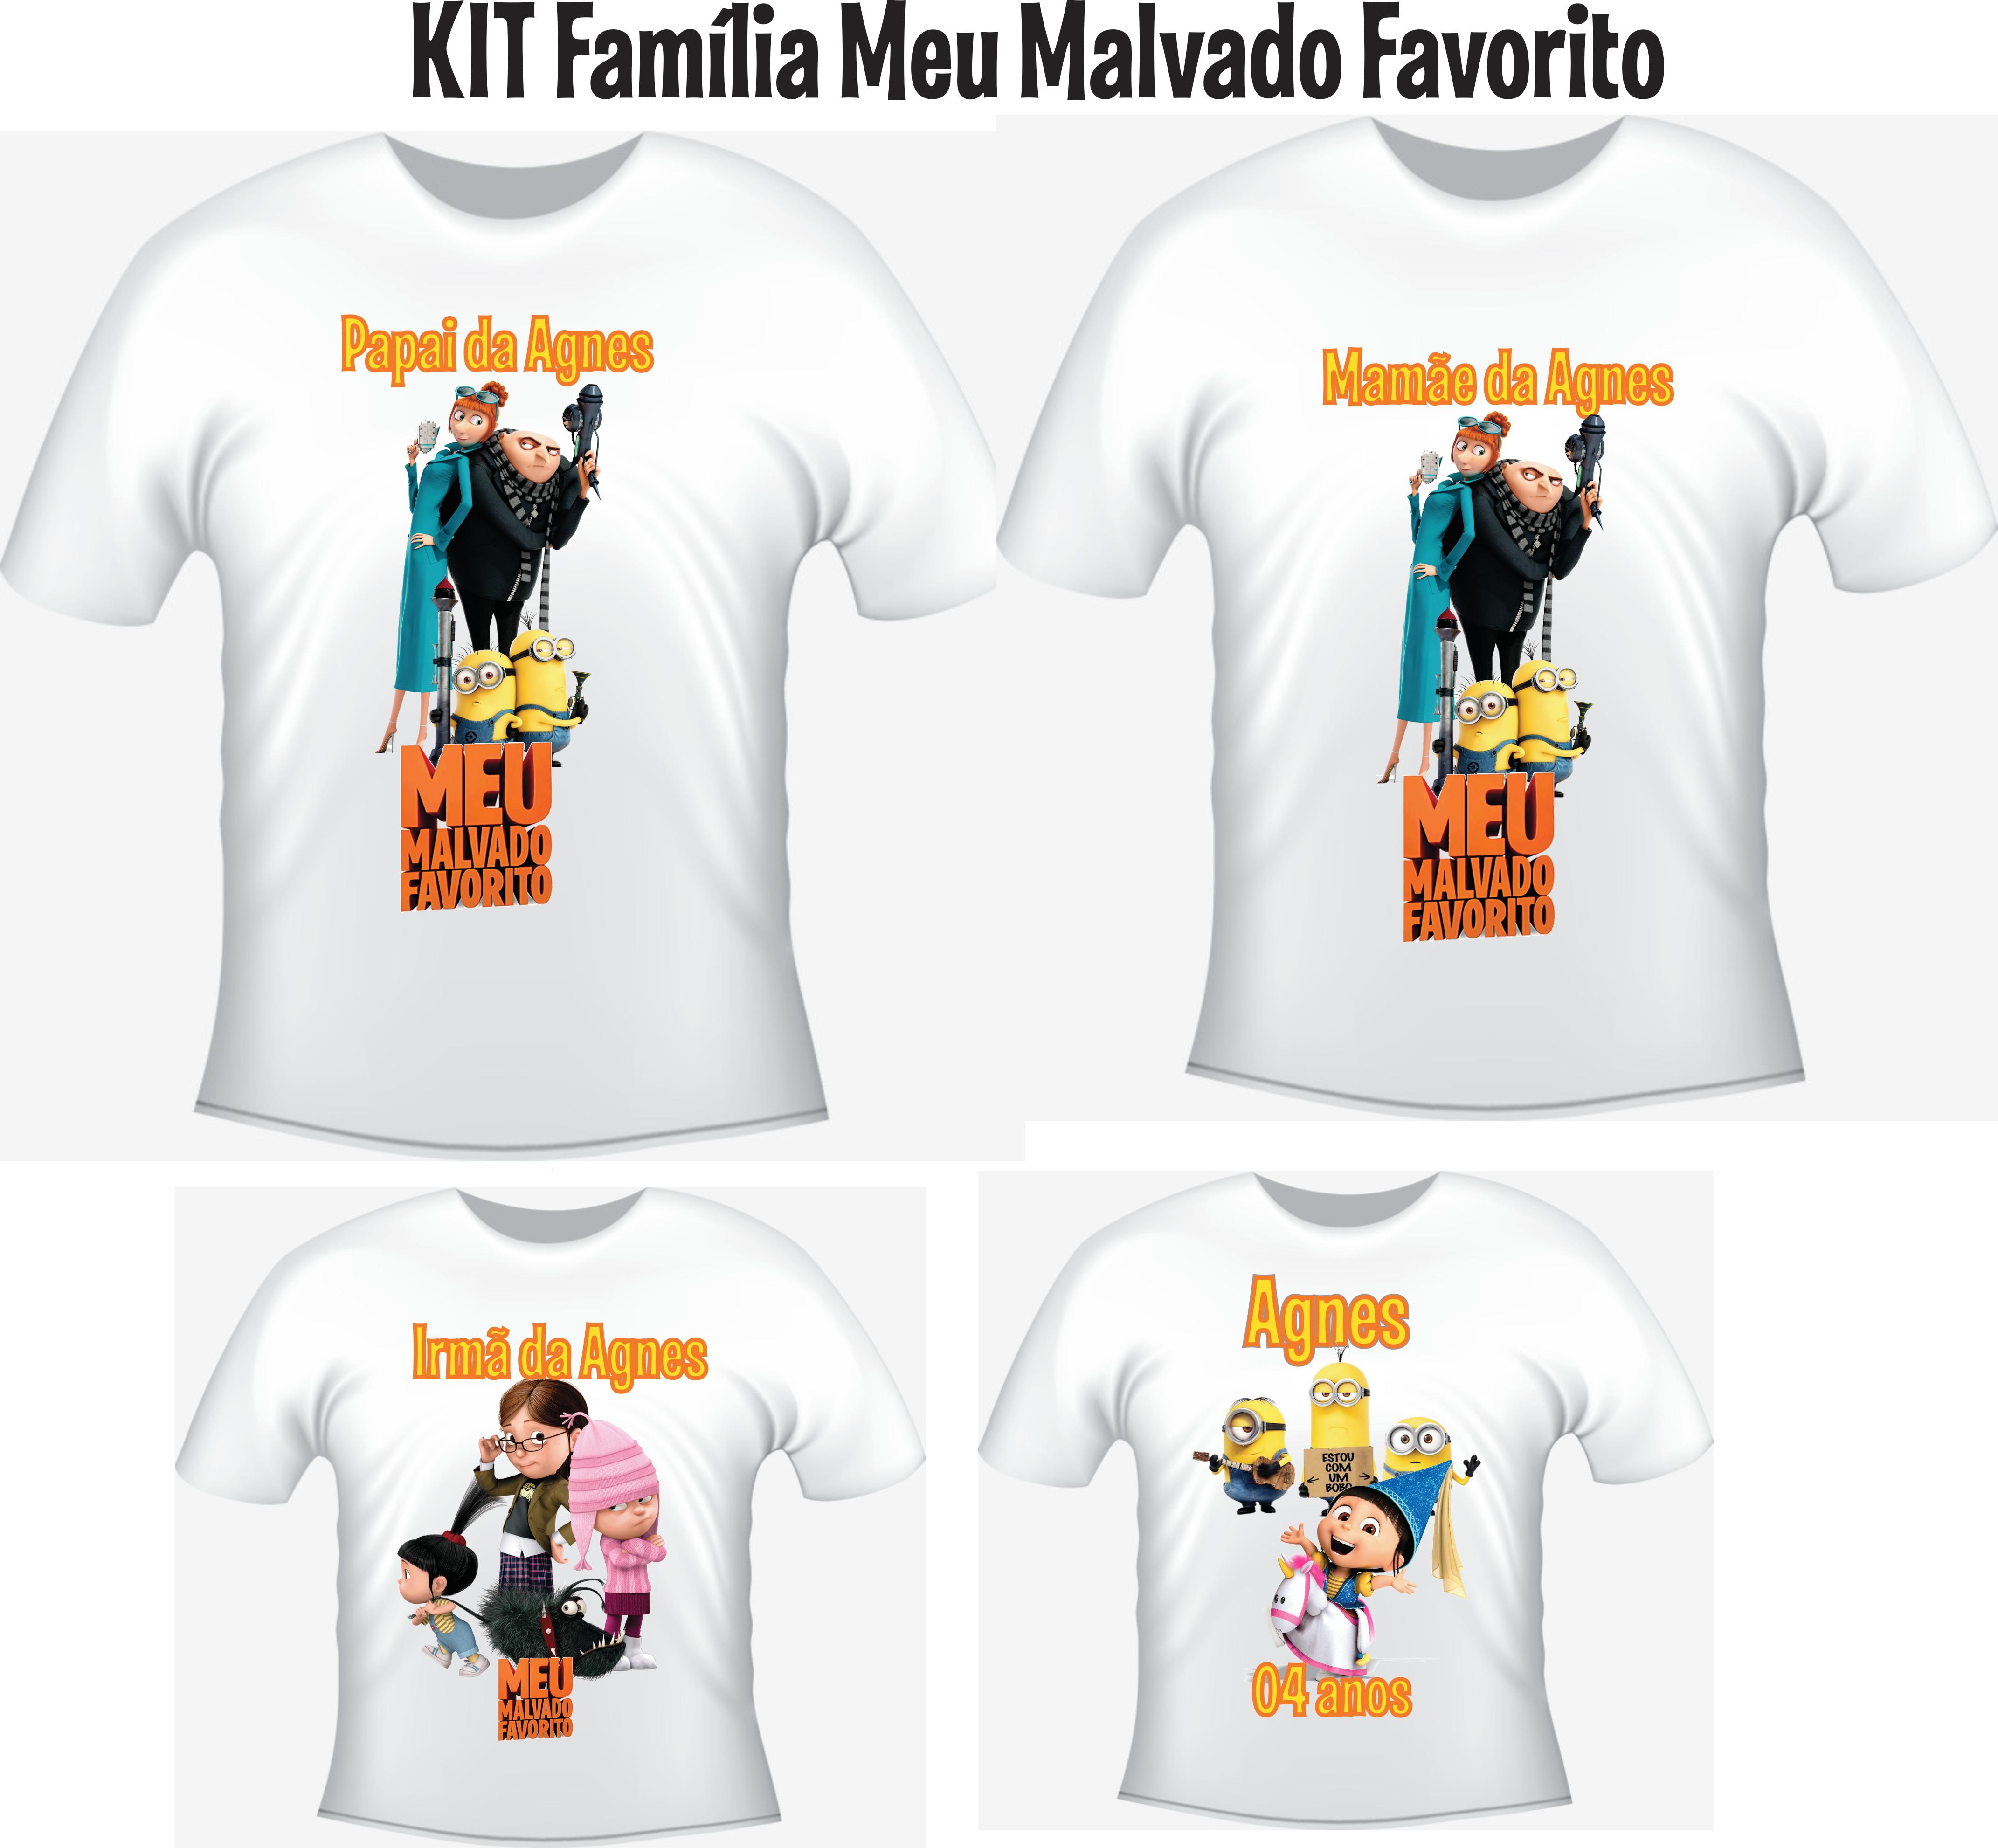 20eea83ce528 Kit 4 Camisetas Pai Mae Filho Filha Meu Malvado Favorito   Elo7